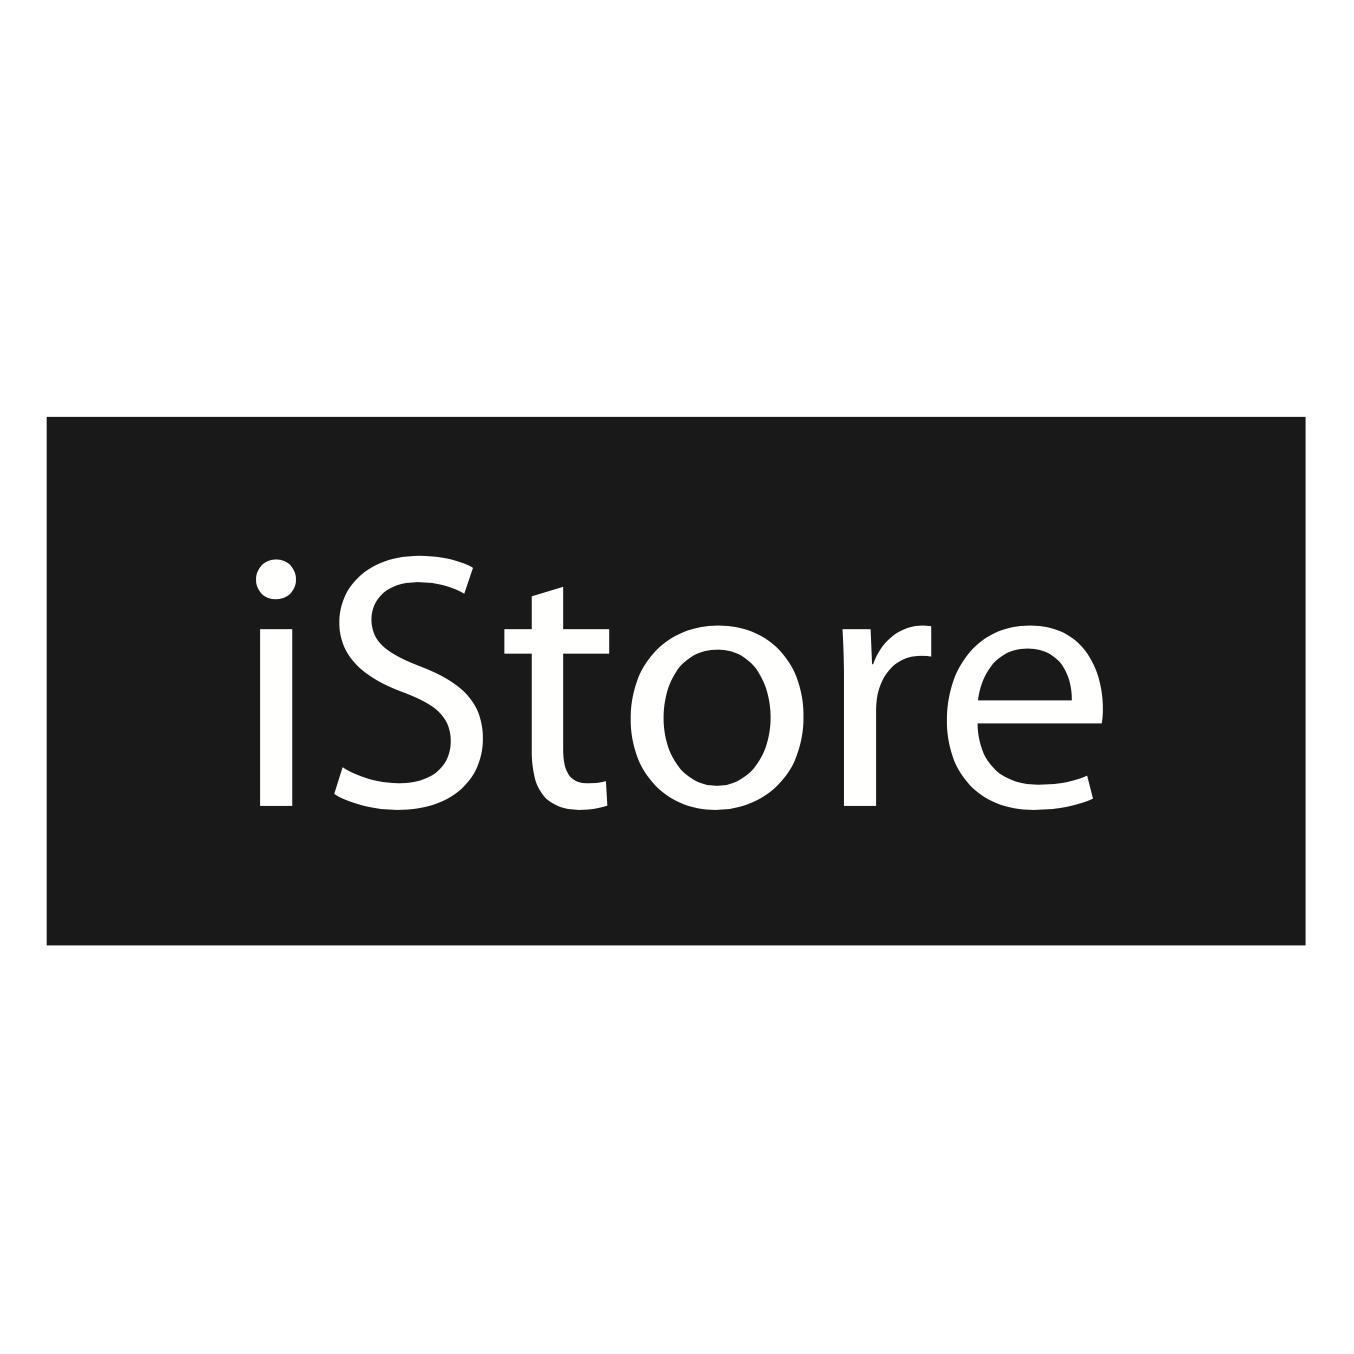 iPhone X 64GB - Space Grey